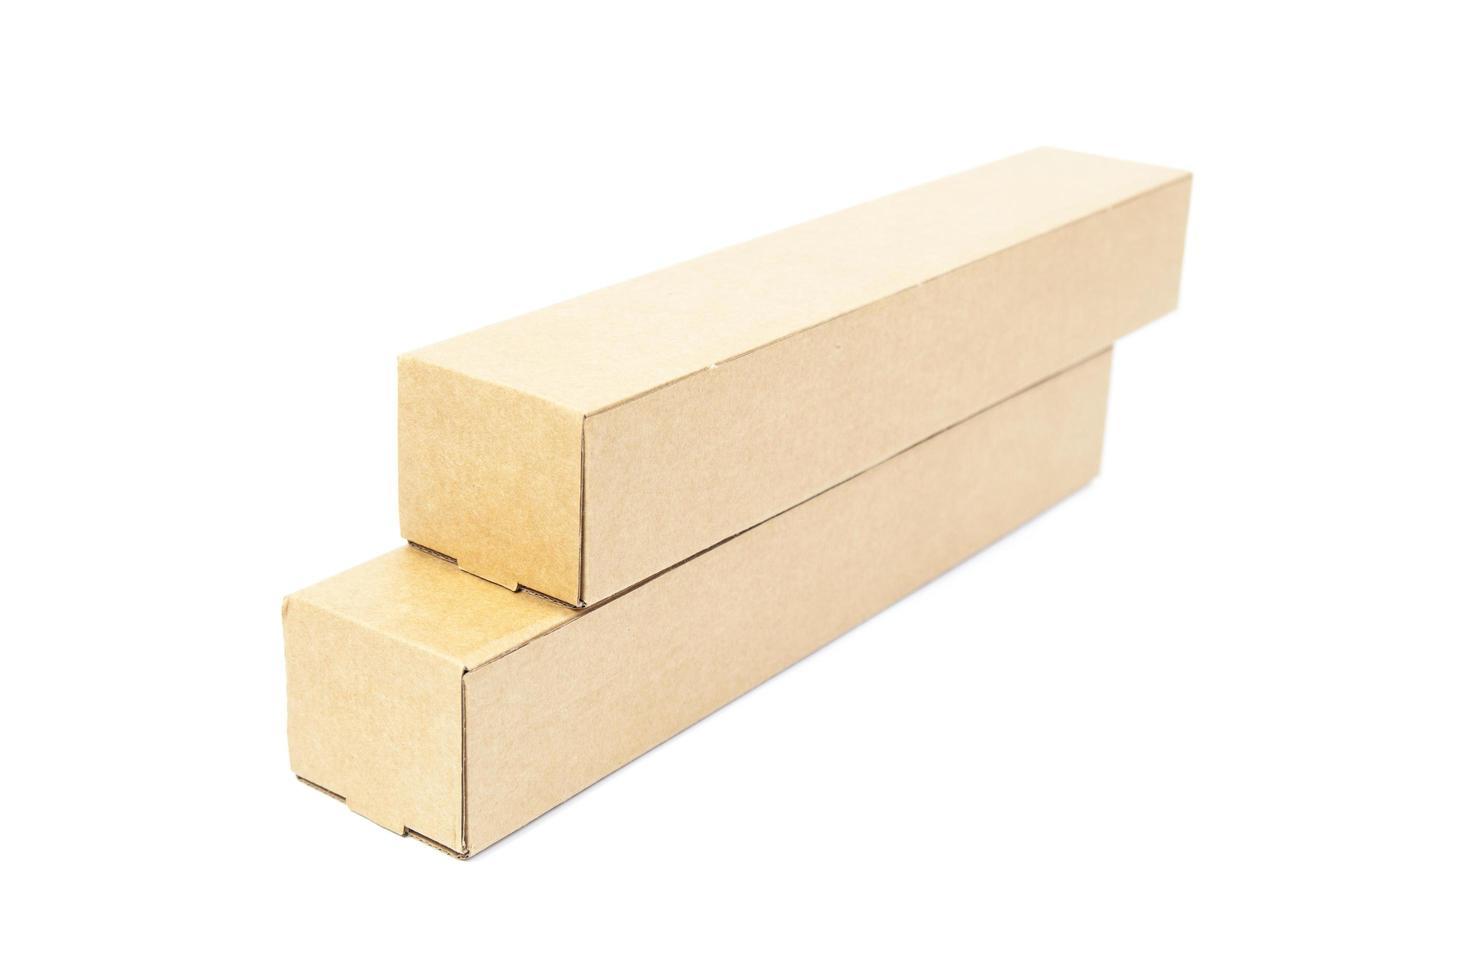 boîtes en carton marron sur fond blanc photo